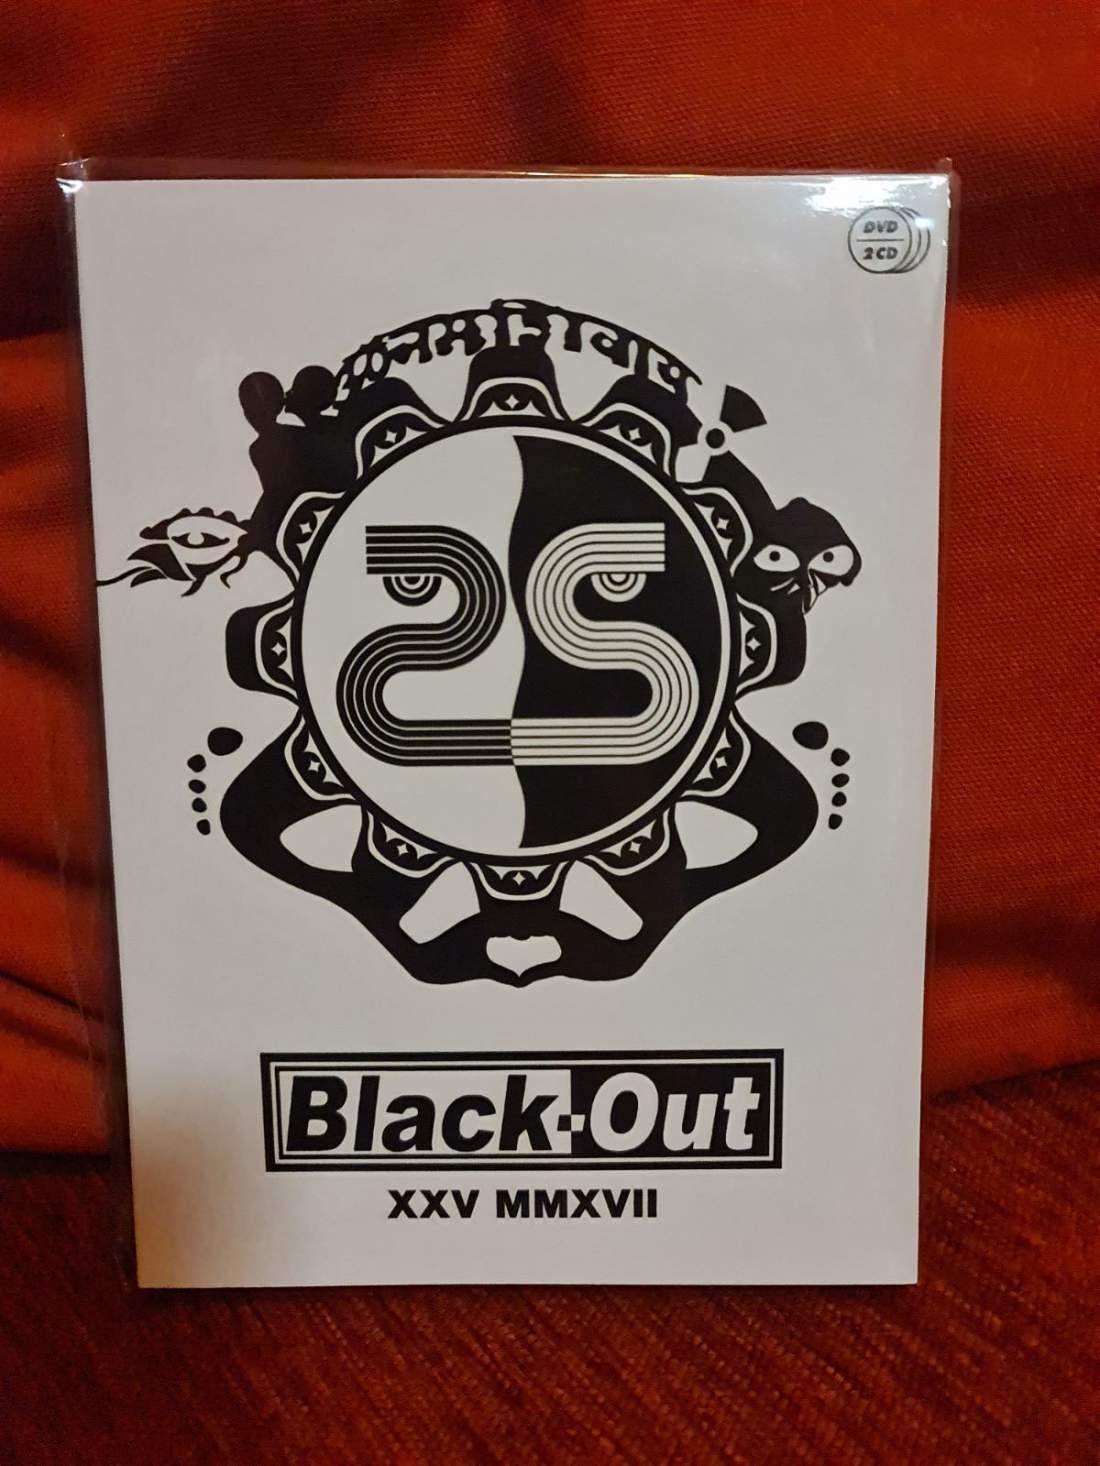 BLACK-OUT XXV MMXVII 25 ÉVES JUBILEUMI KONCERT DVD+2CD